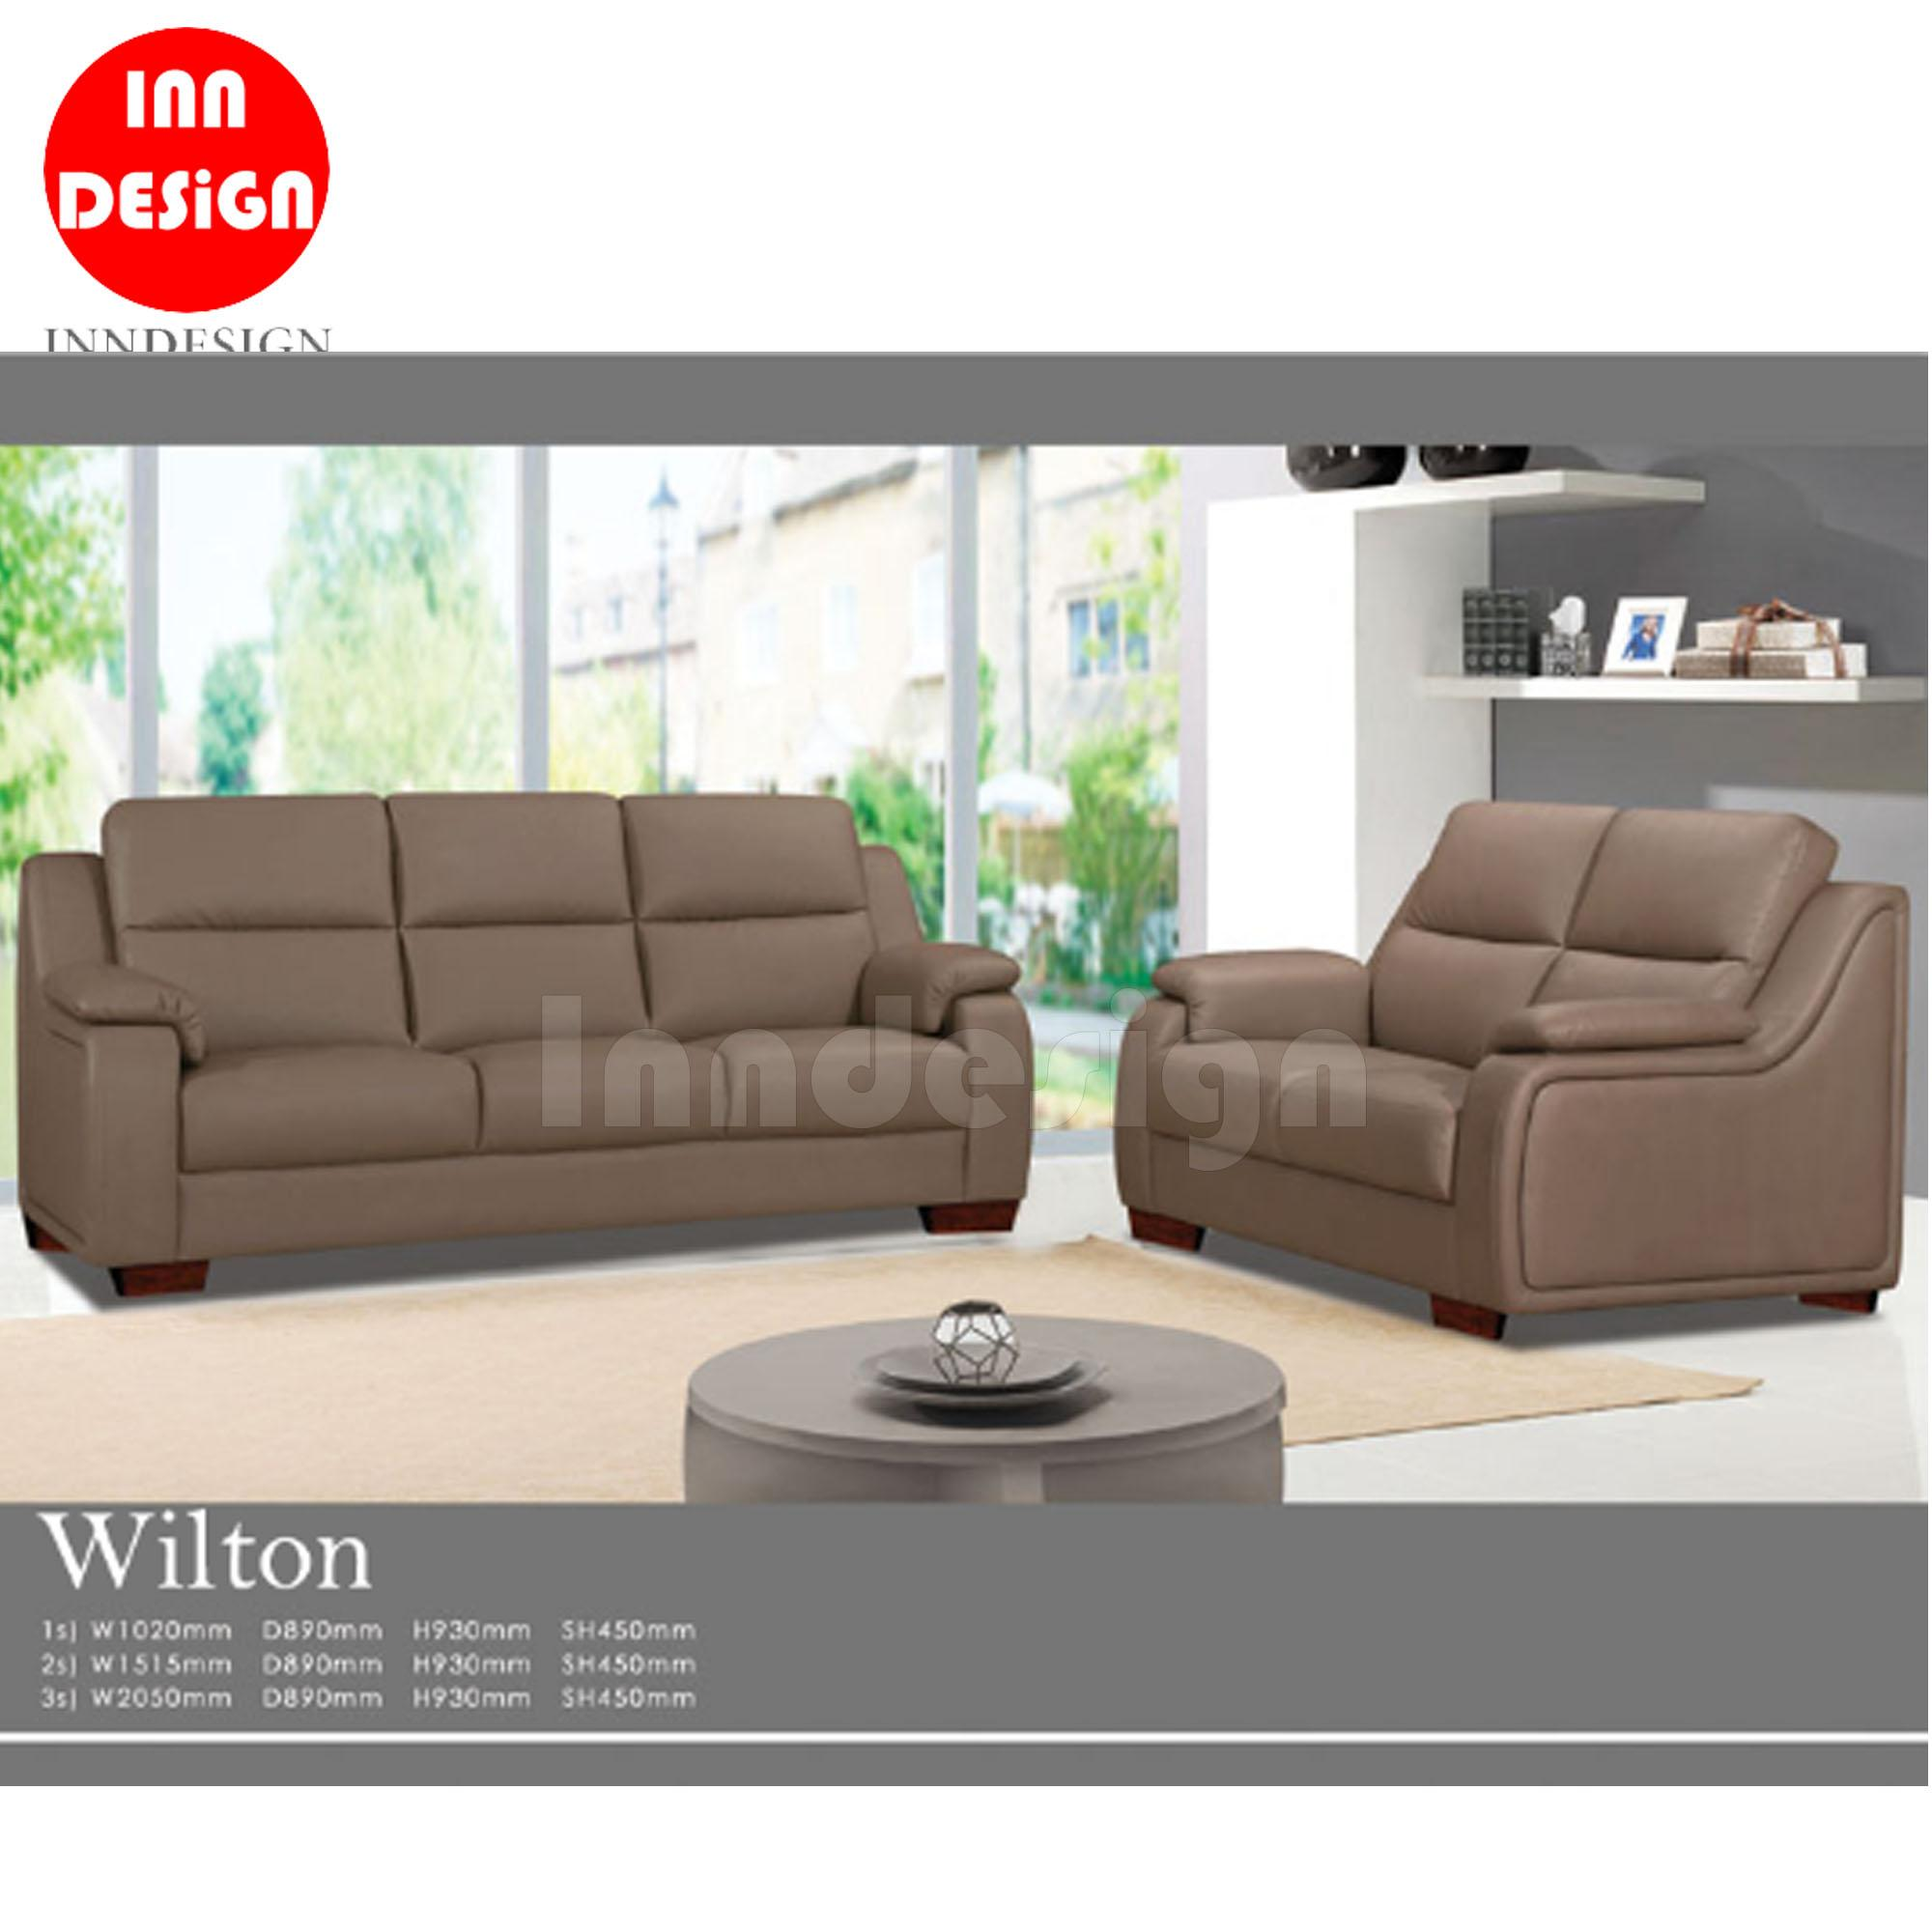 Wilton 1 / 2 / 3 Sofa Set (Half Leather)